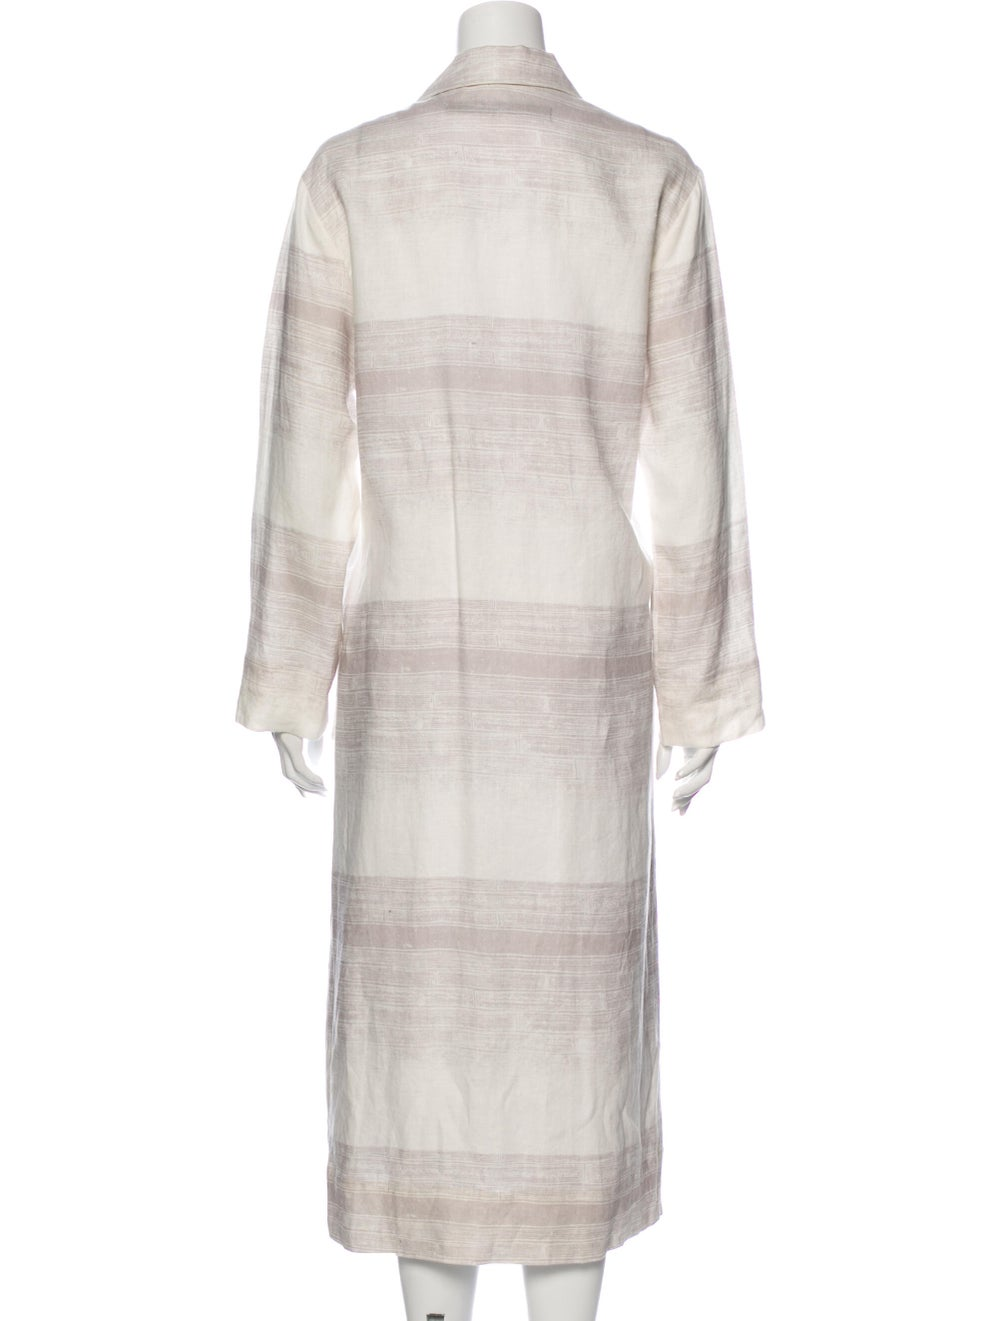 Raquel Allegra Linen Striped Jacket White - image 3